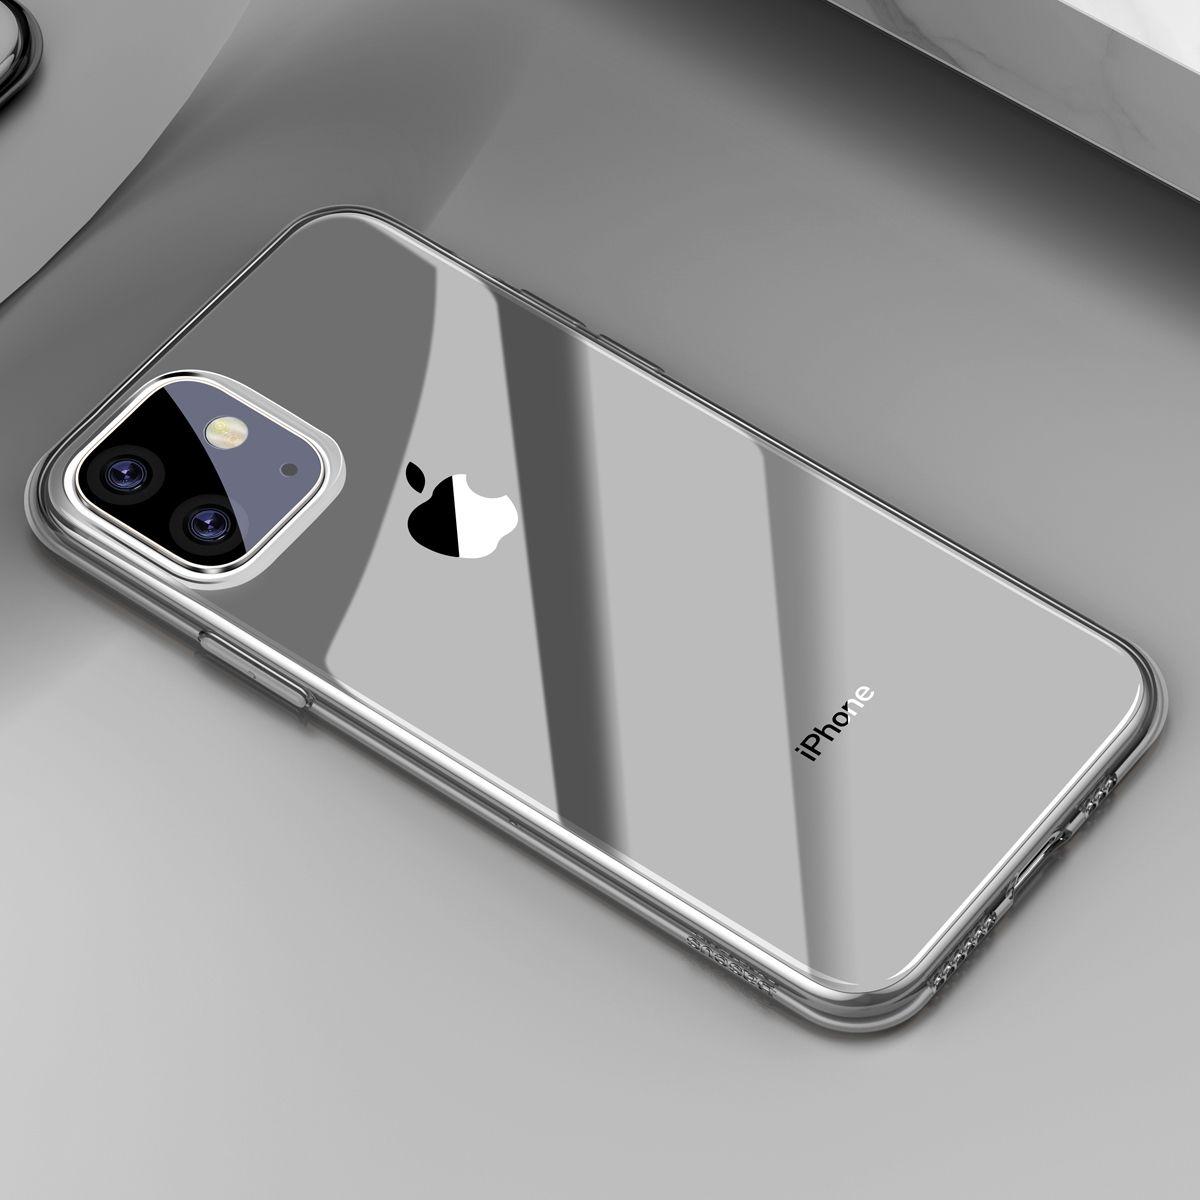 Capa Protetora Baseus Simplicity para iPhone 11